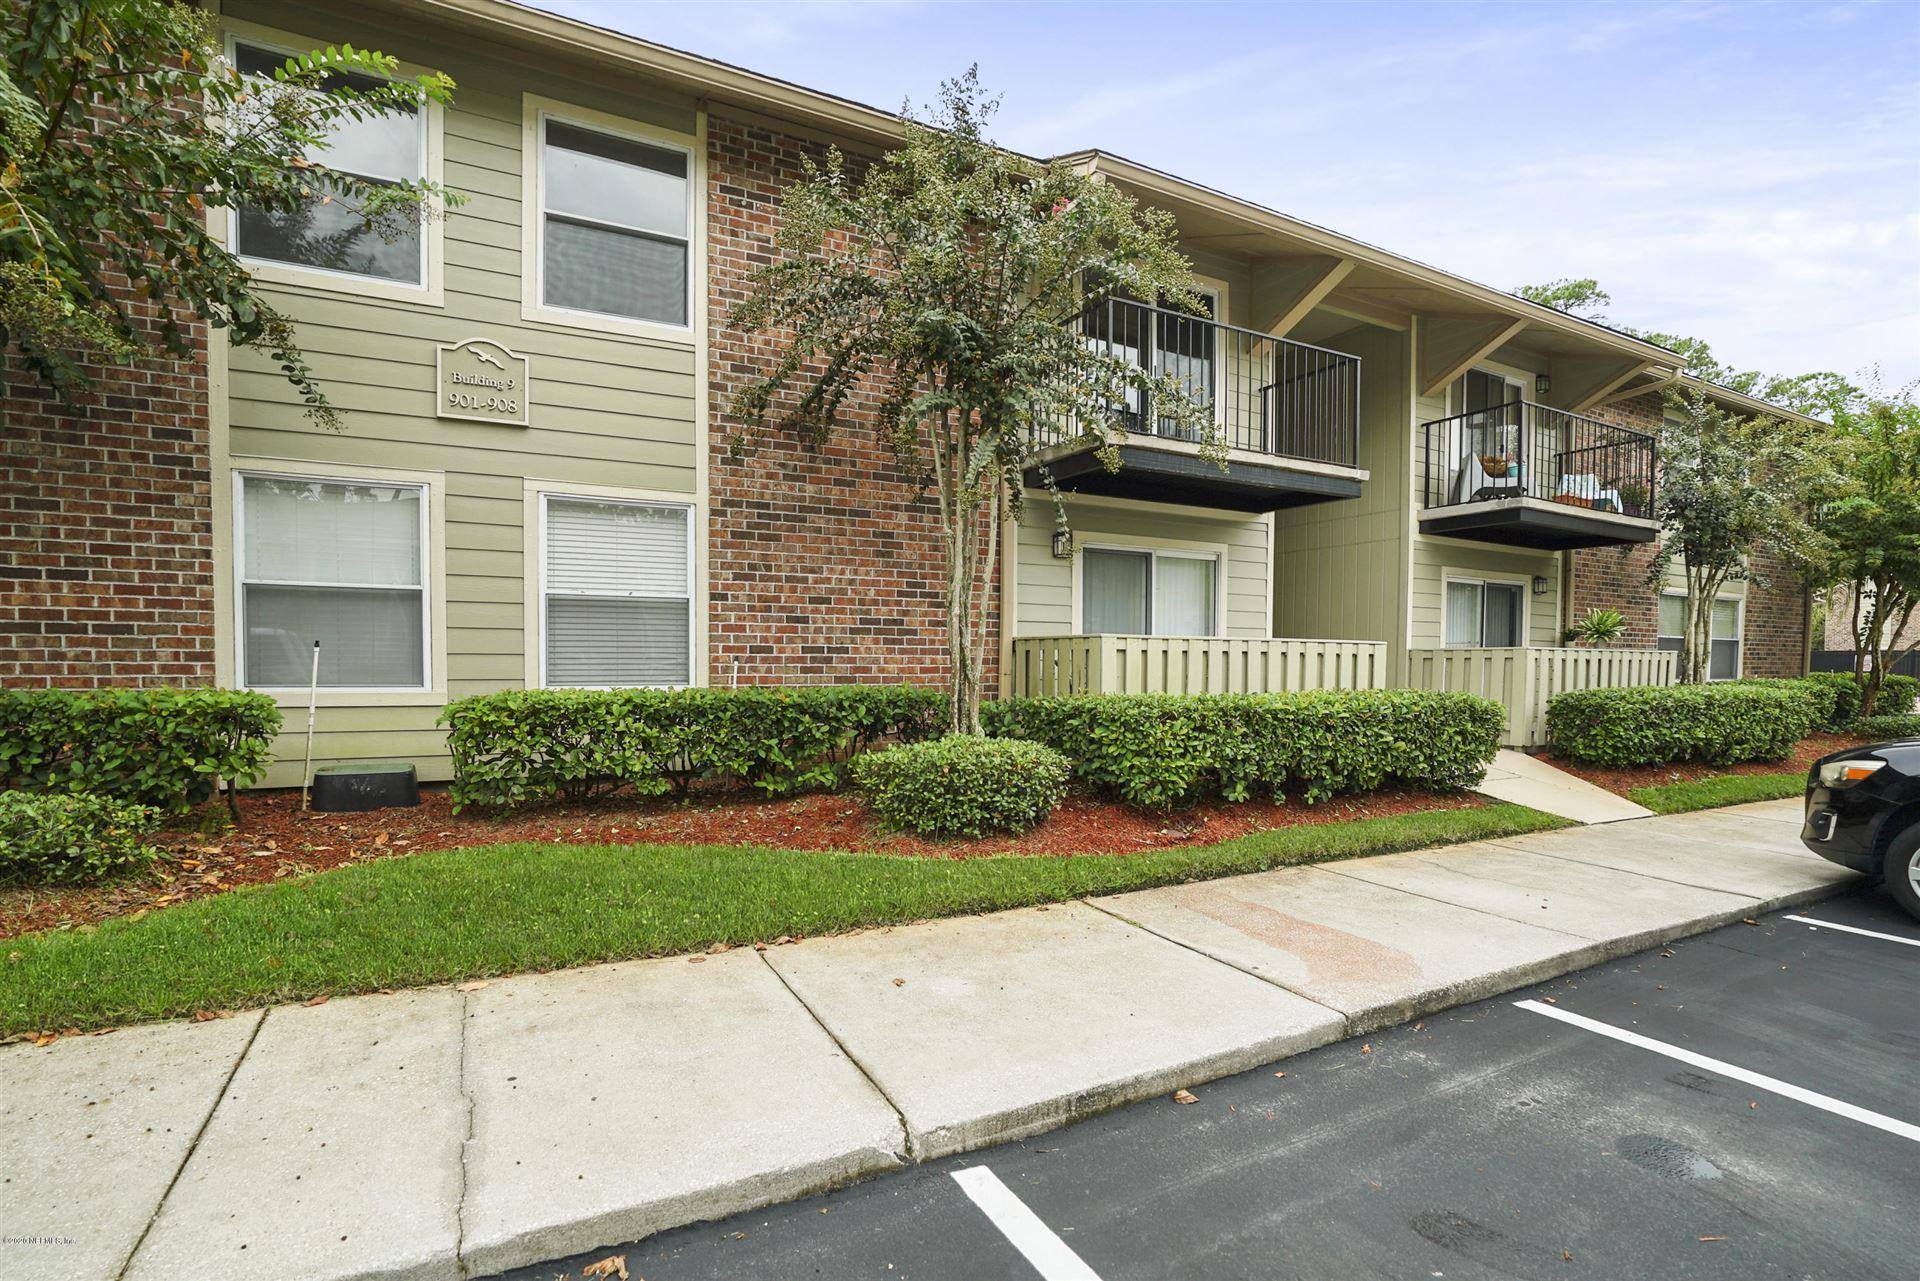 3737 LORETTO RD, Jacksonville, FL 32223 - MLS#: 1073563